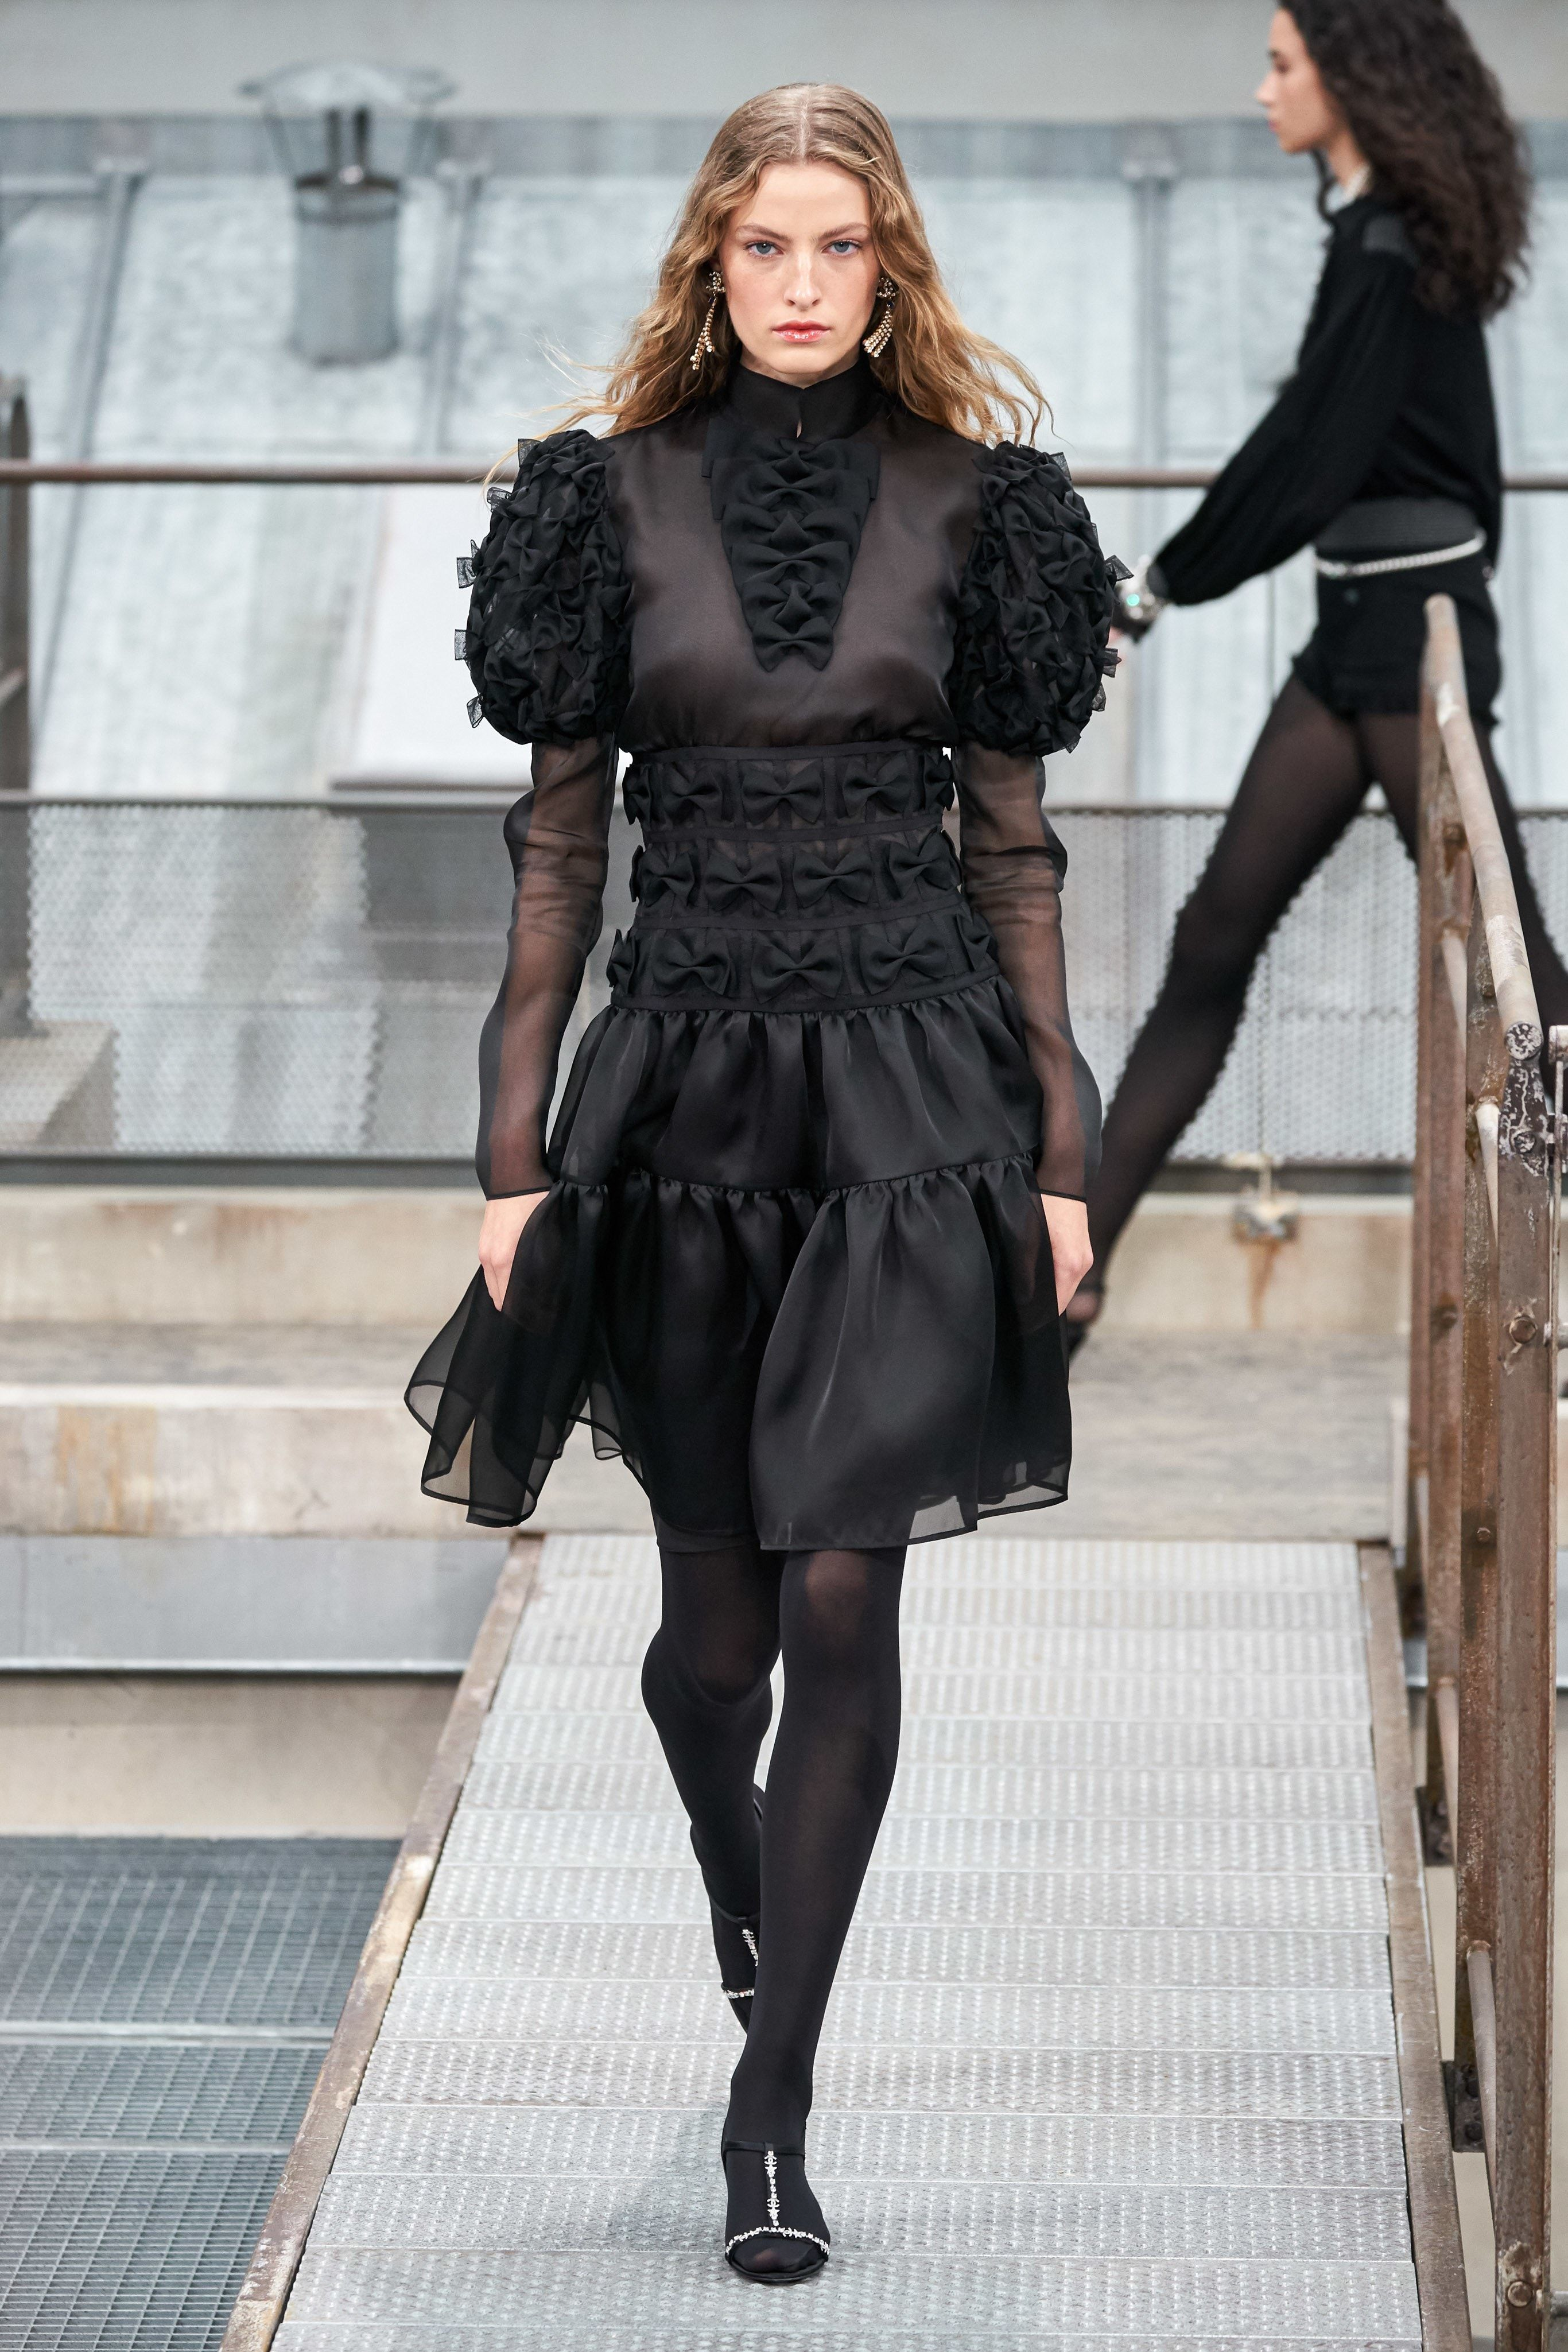 CHANEL THE MÉTIERS D'ART SHOW 2019/20 Chanel Runway(画像あり)